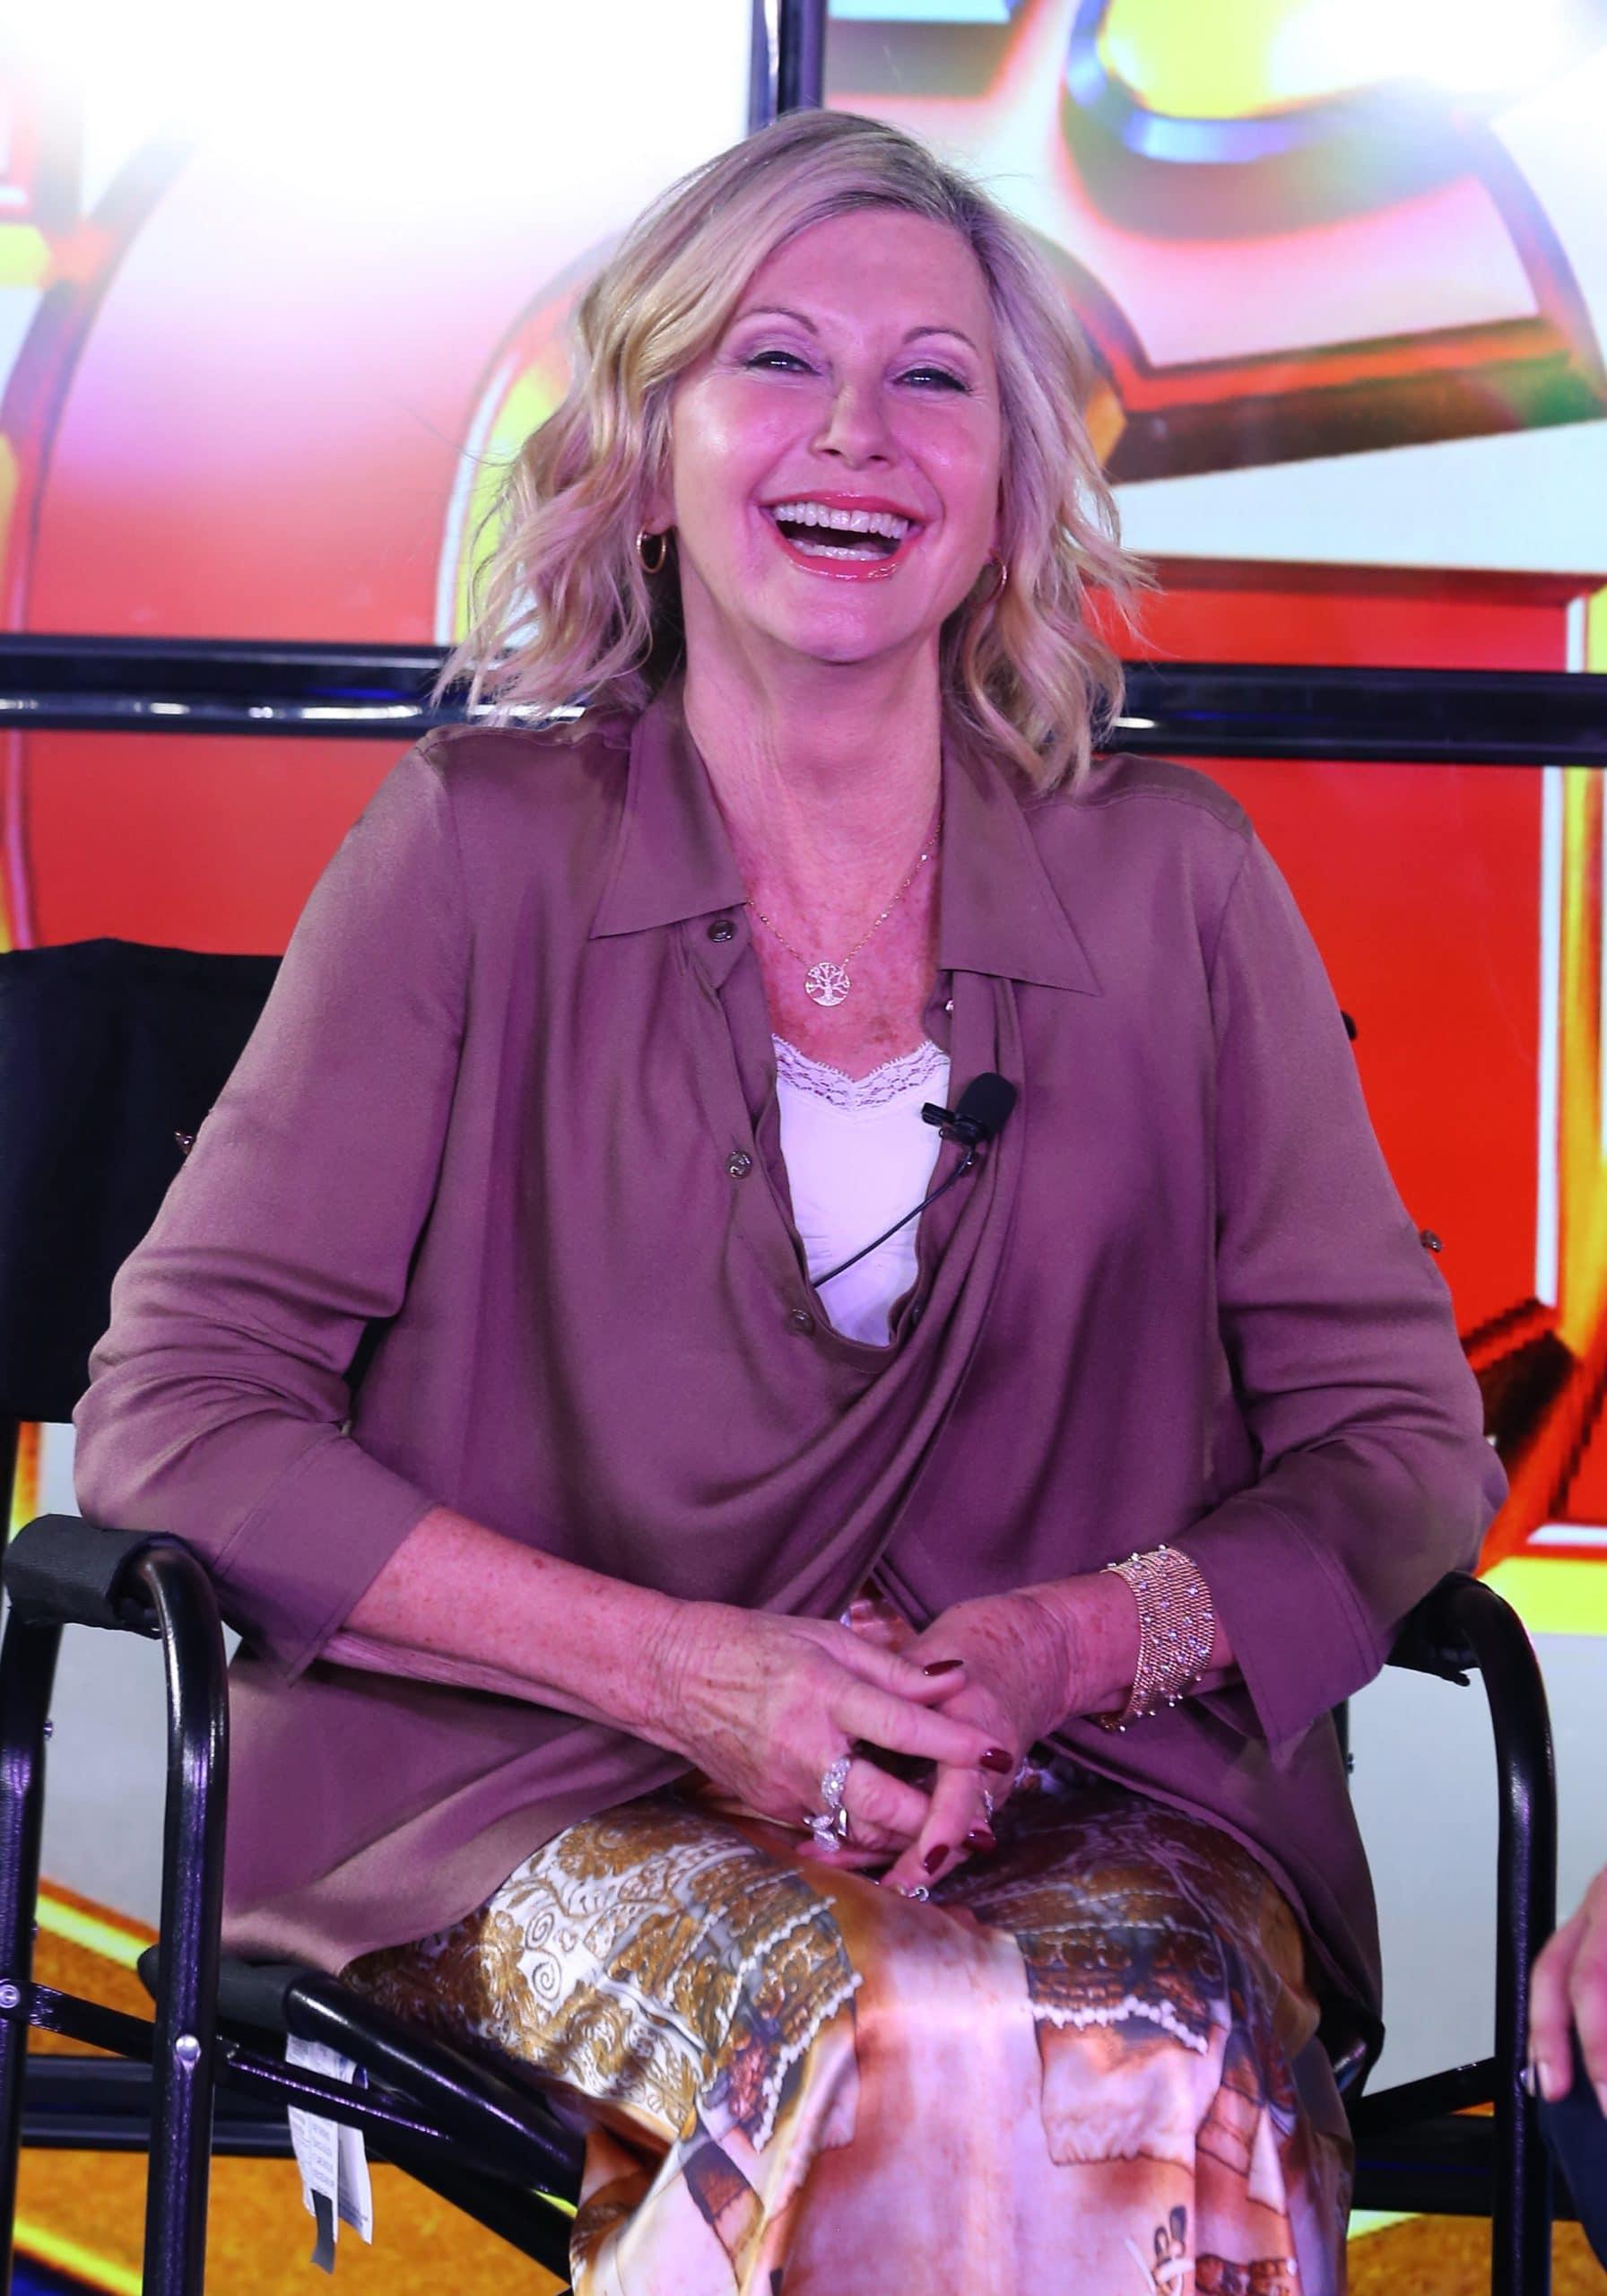 Olivia Newton-John's Plans For The COVID-19 Vaccine Amid Cancer Battle